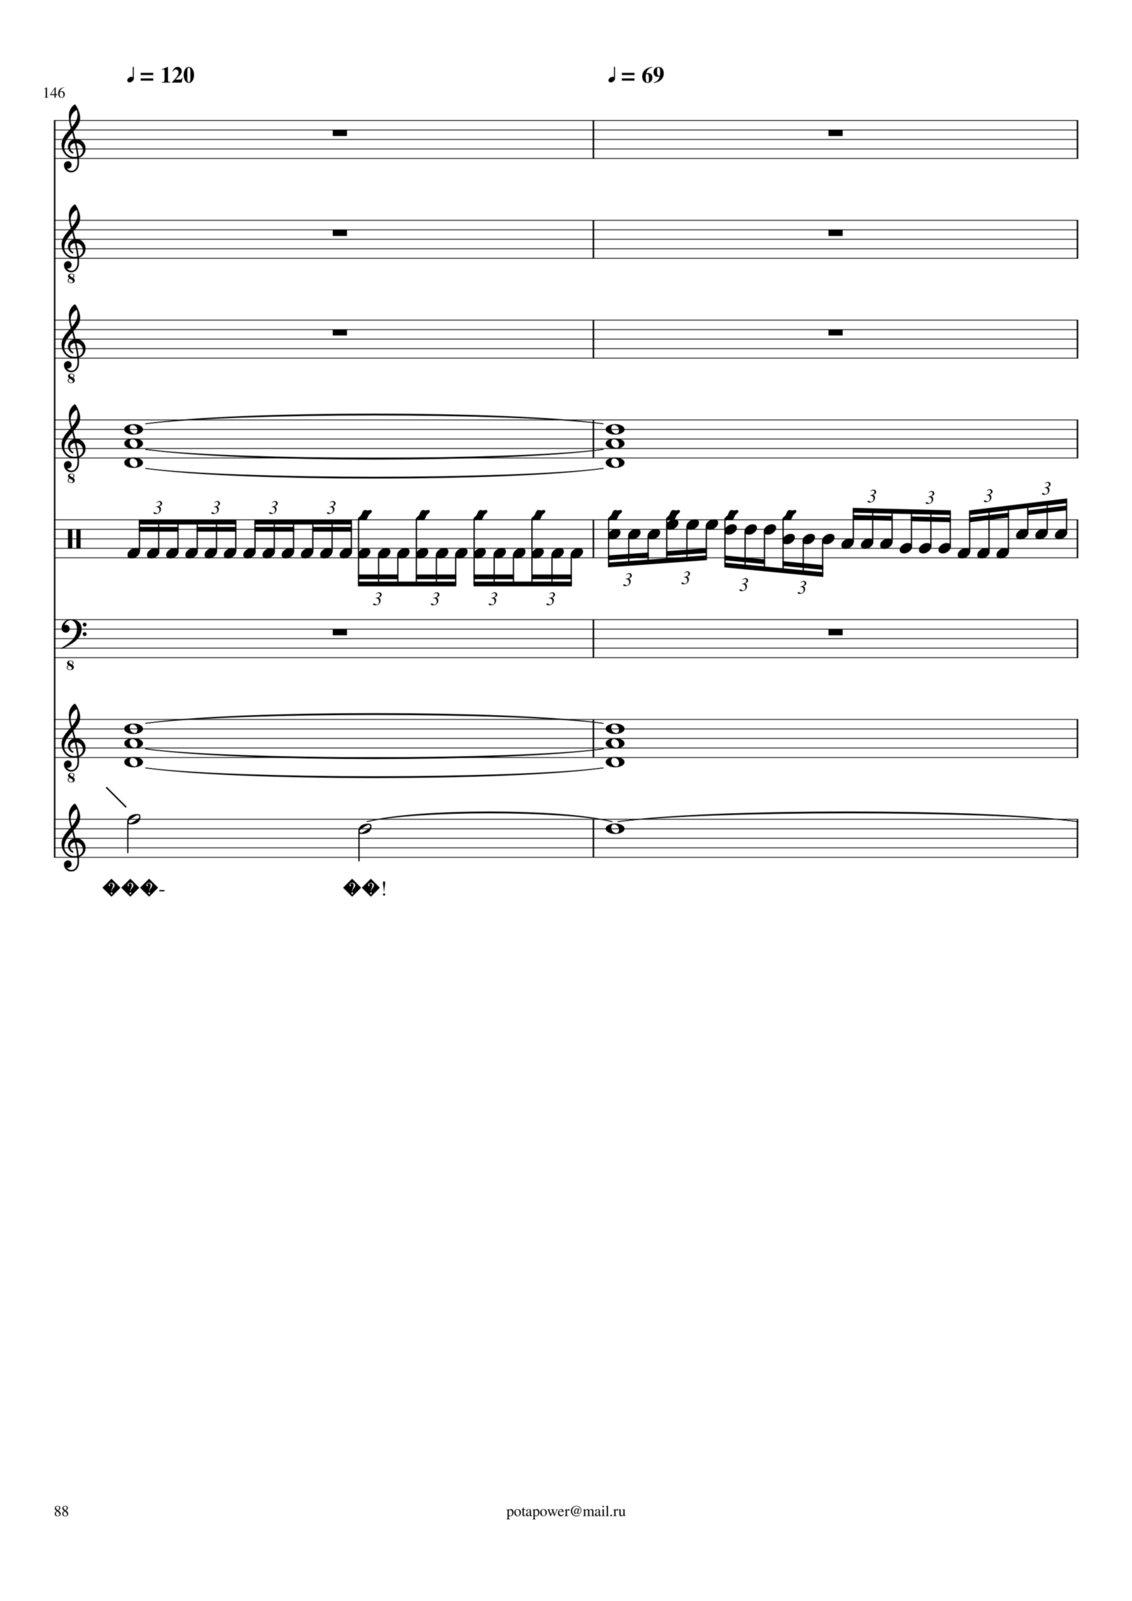 Korolevstvo slez slide, Image 88